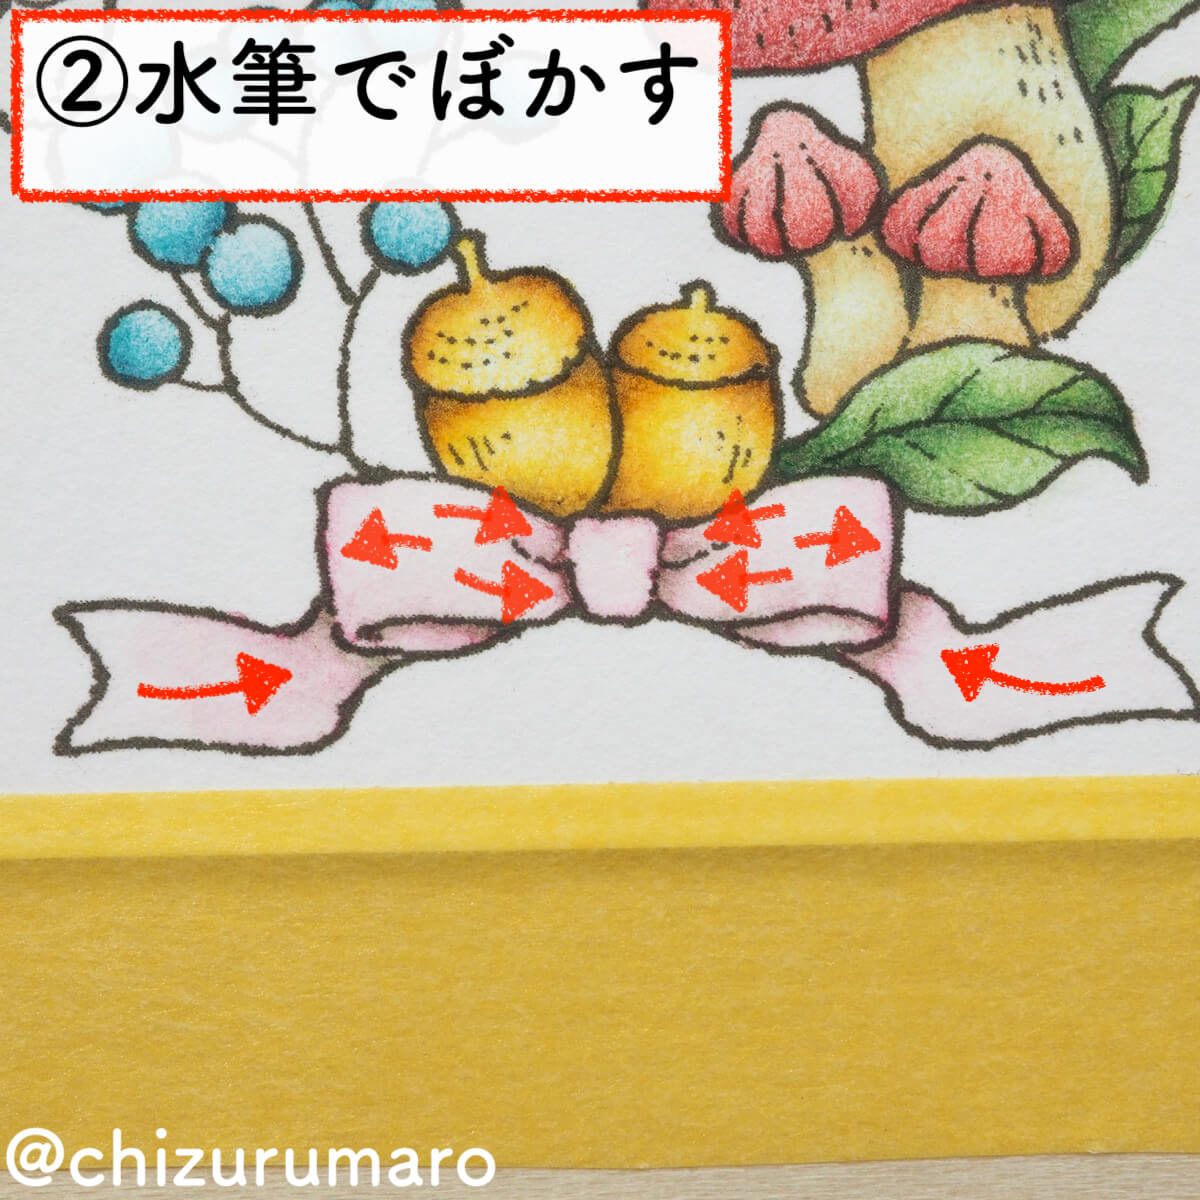 f:id:chizurumaro:20200218125712j:plain